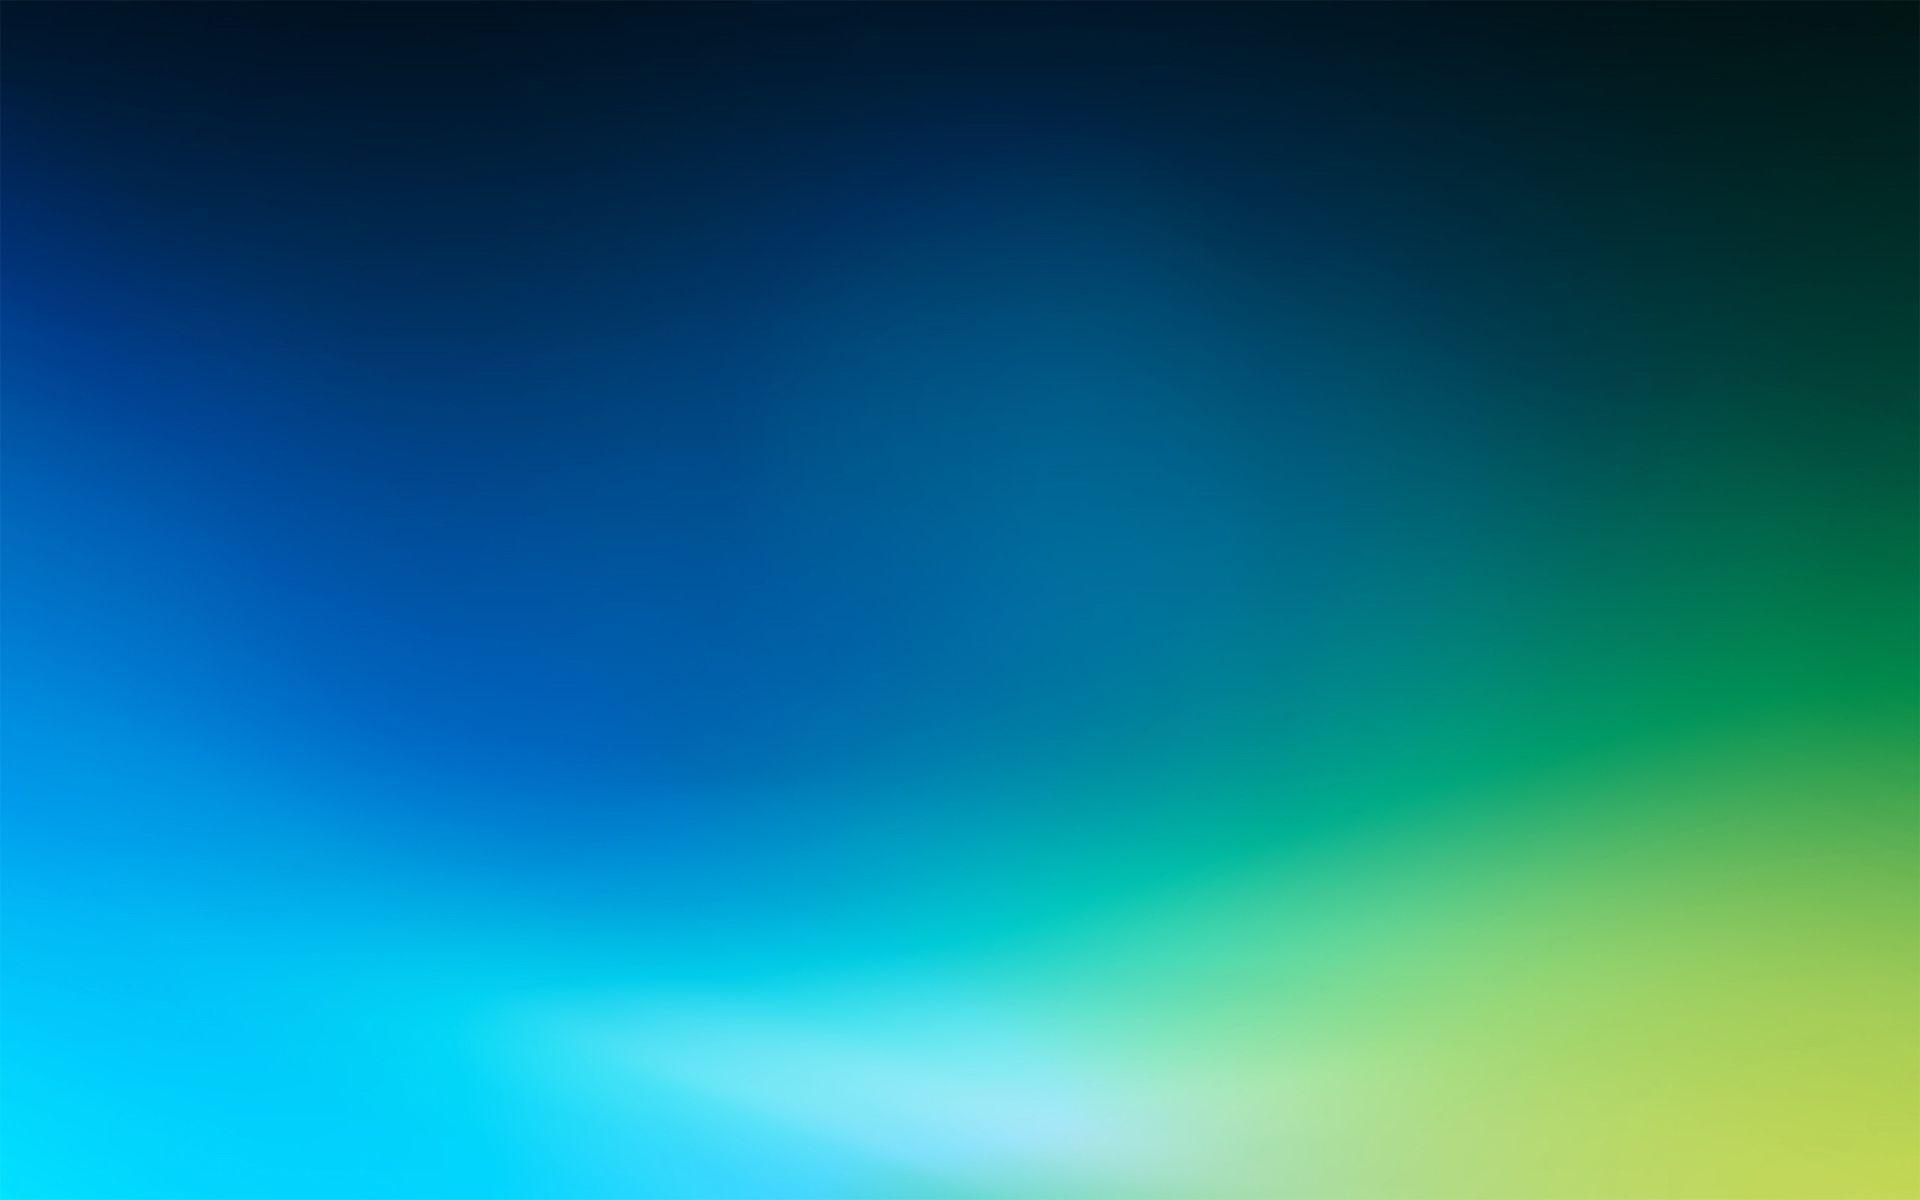 Fall Computer Wallpaper Backgrounds Hd Gradient Backgrounds Pixelstalk Net